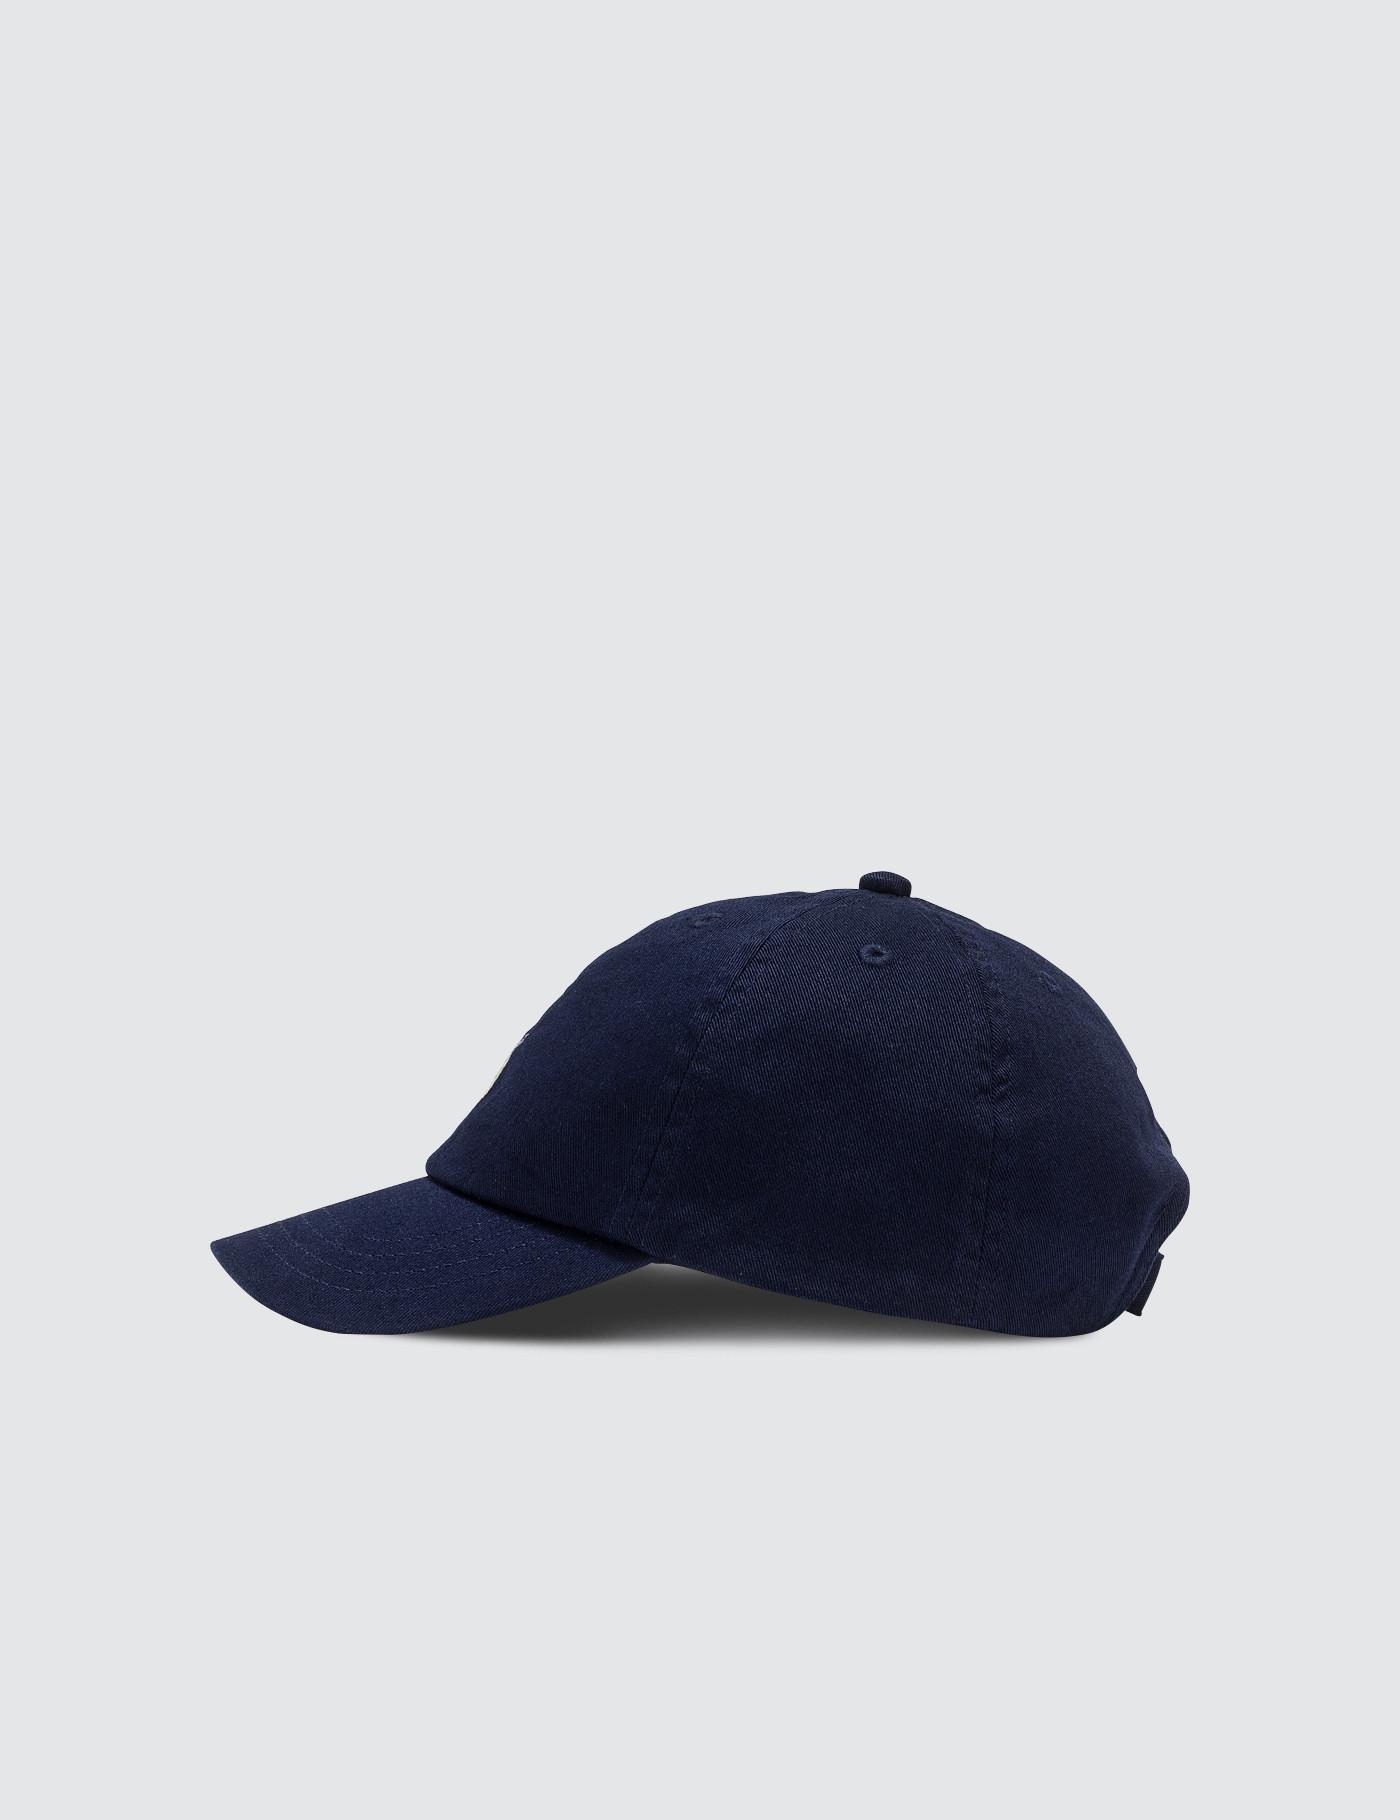 c6bbd3b3b4a2d4 Lyst - Polo Ralph Lauren Classic Cap in Blue for Men